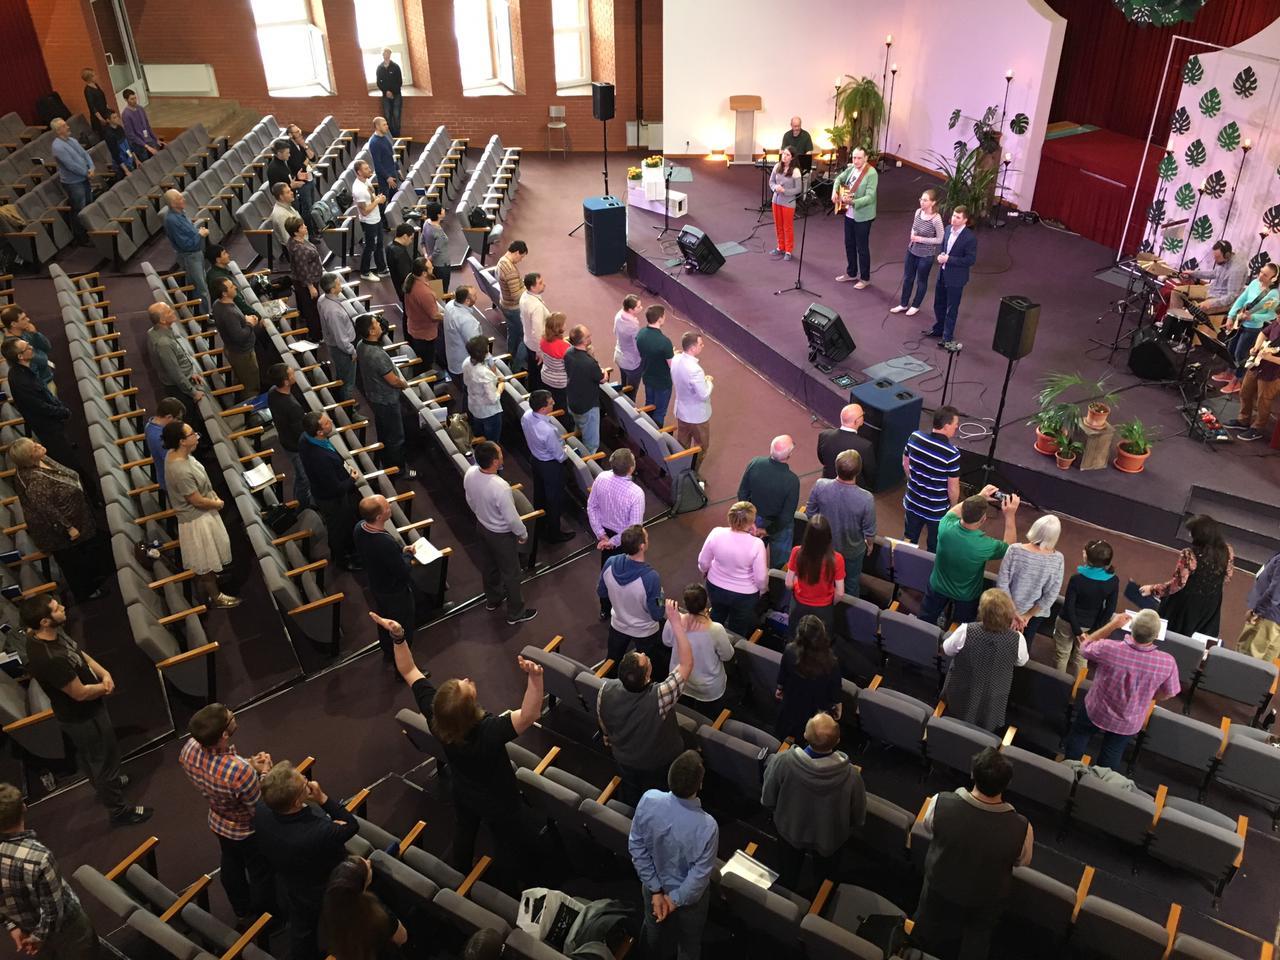 Moskau Selenograd Baptisten Pastorenkonferenz